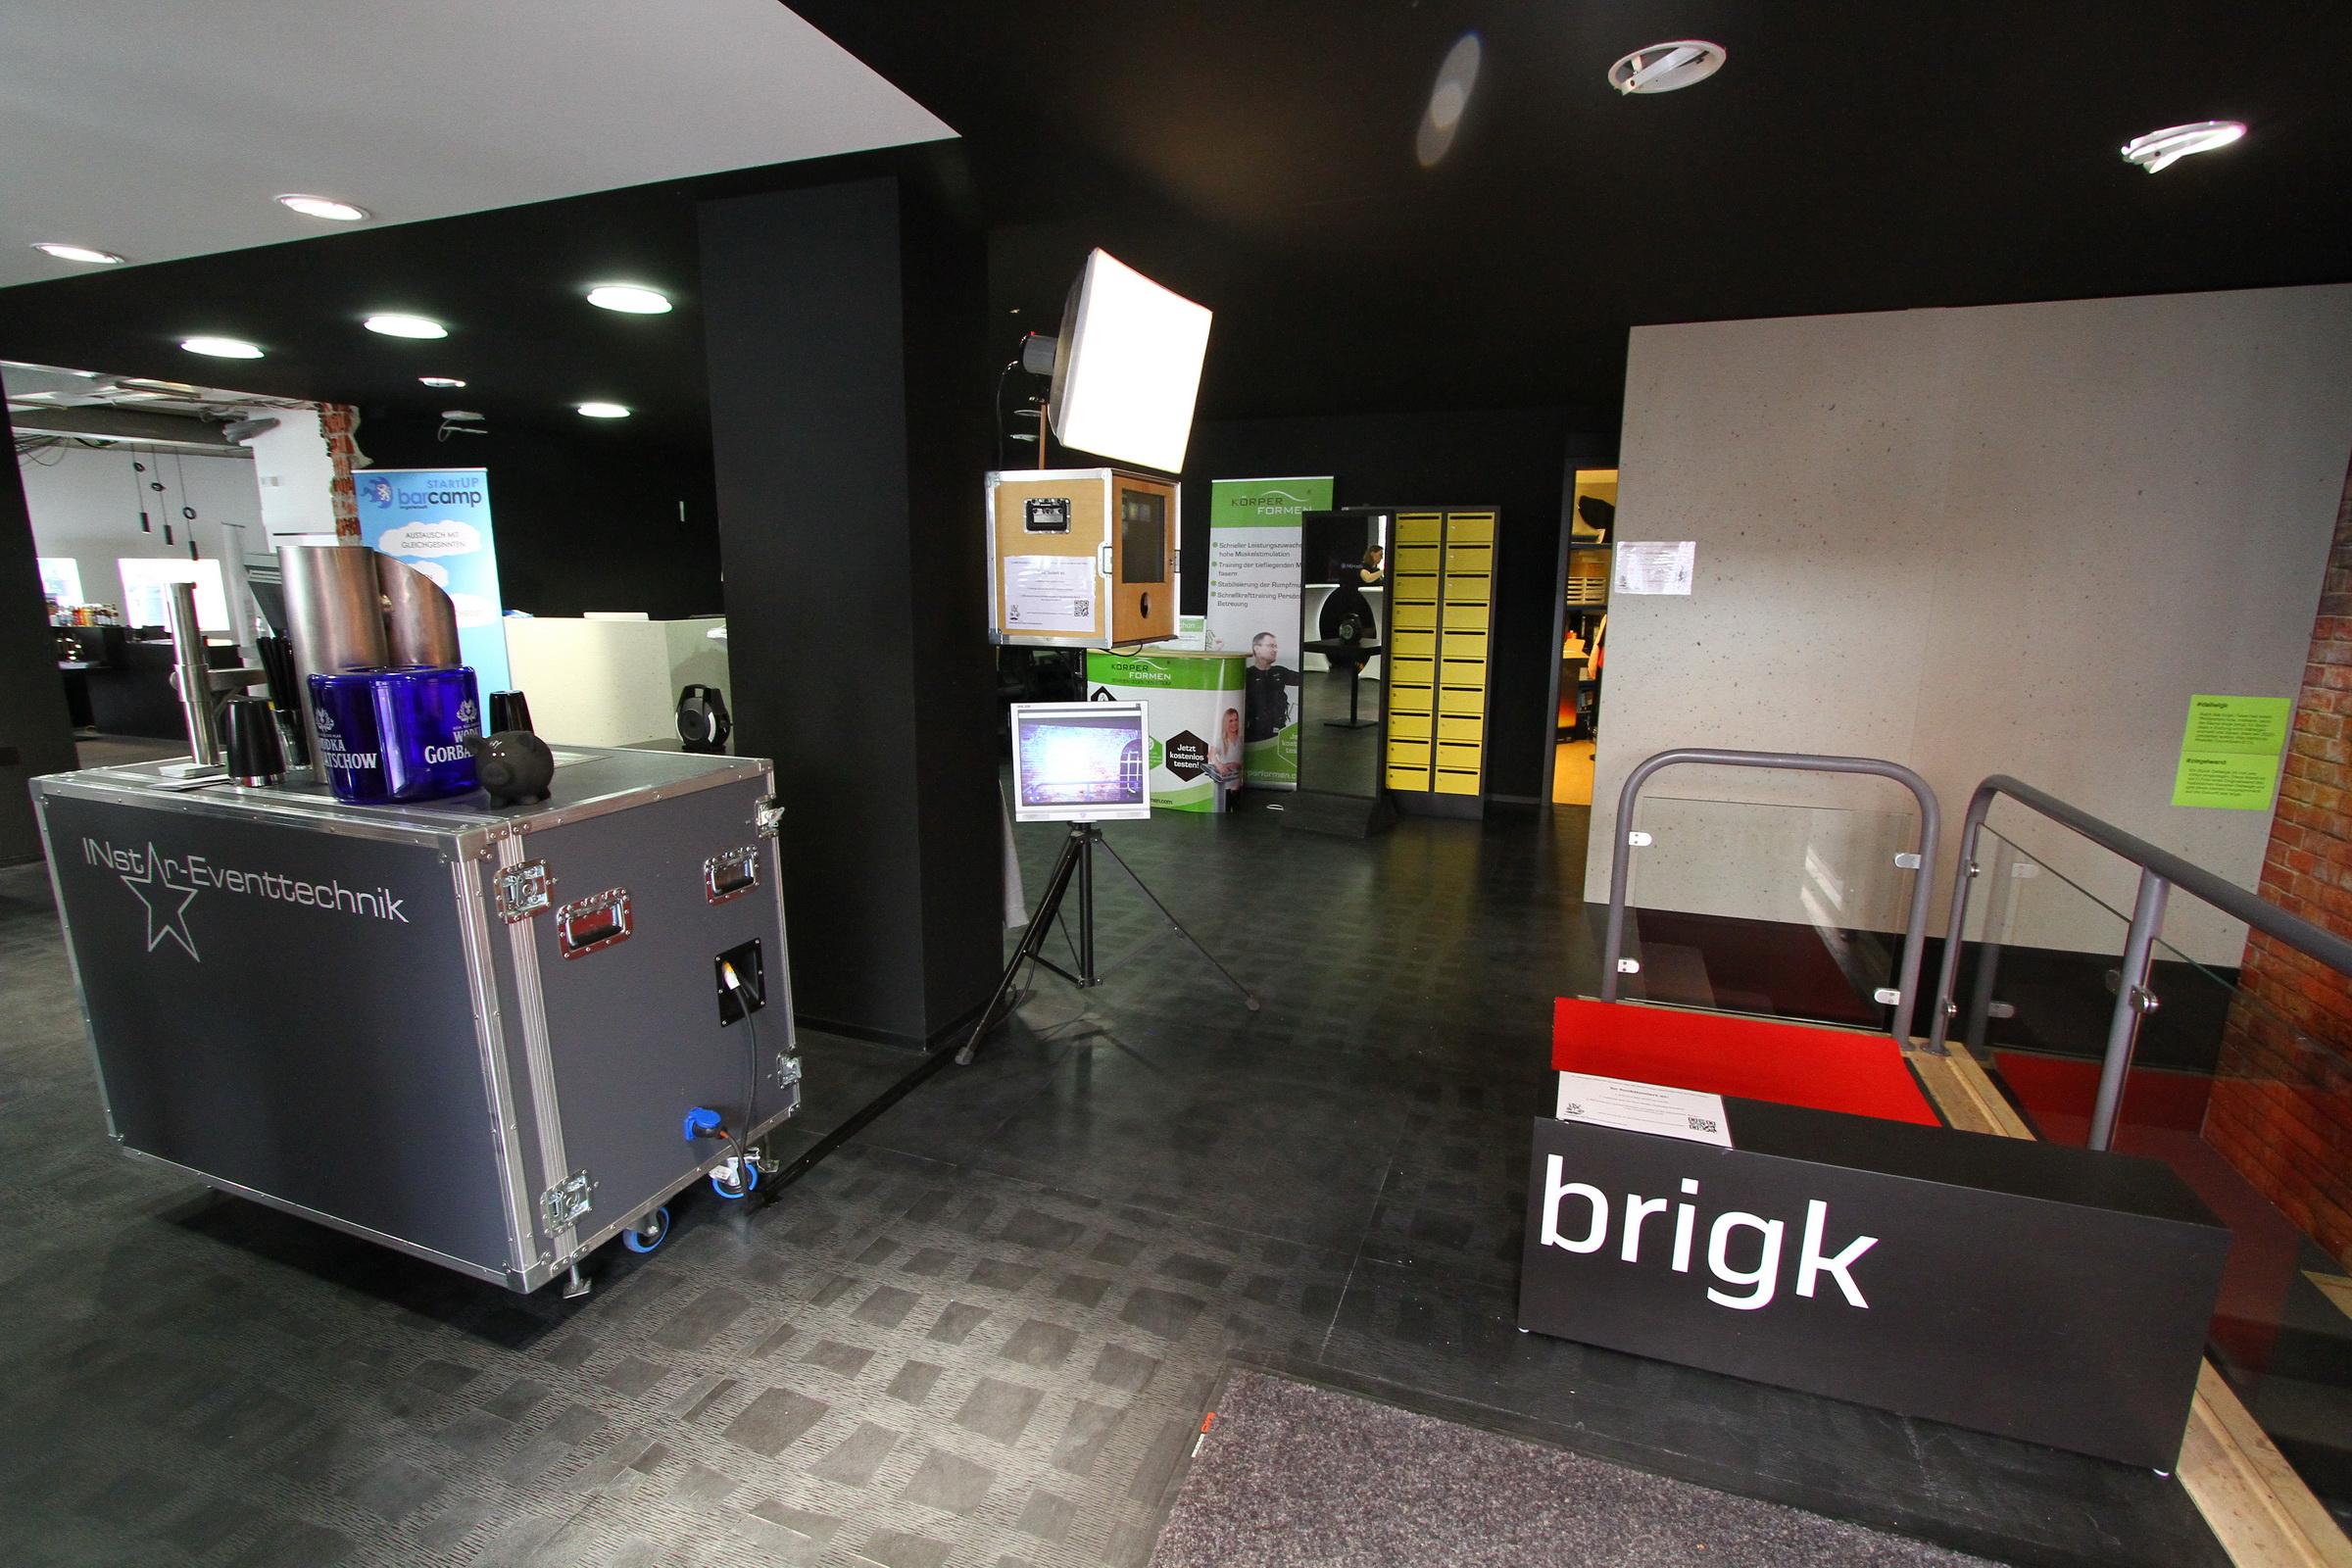 Gründer-Expo im Digitalen Gründerzentrum Ingolstadt 20.04.2018